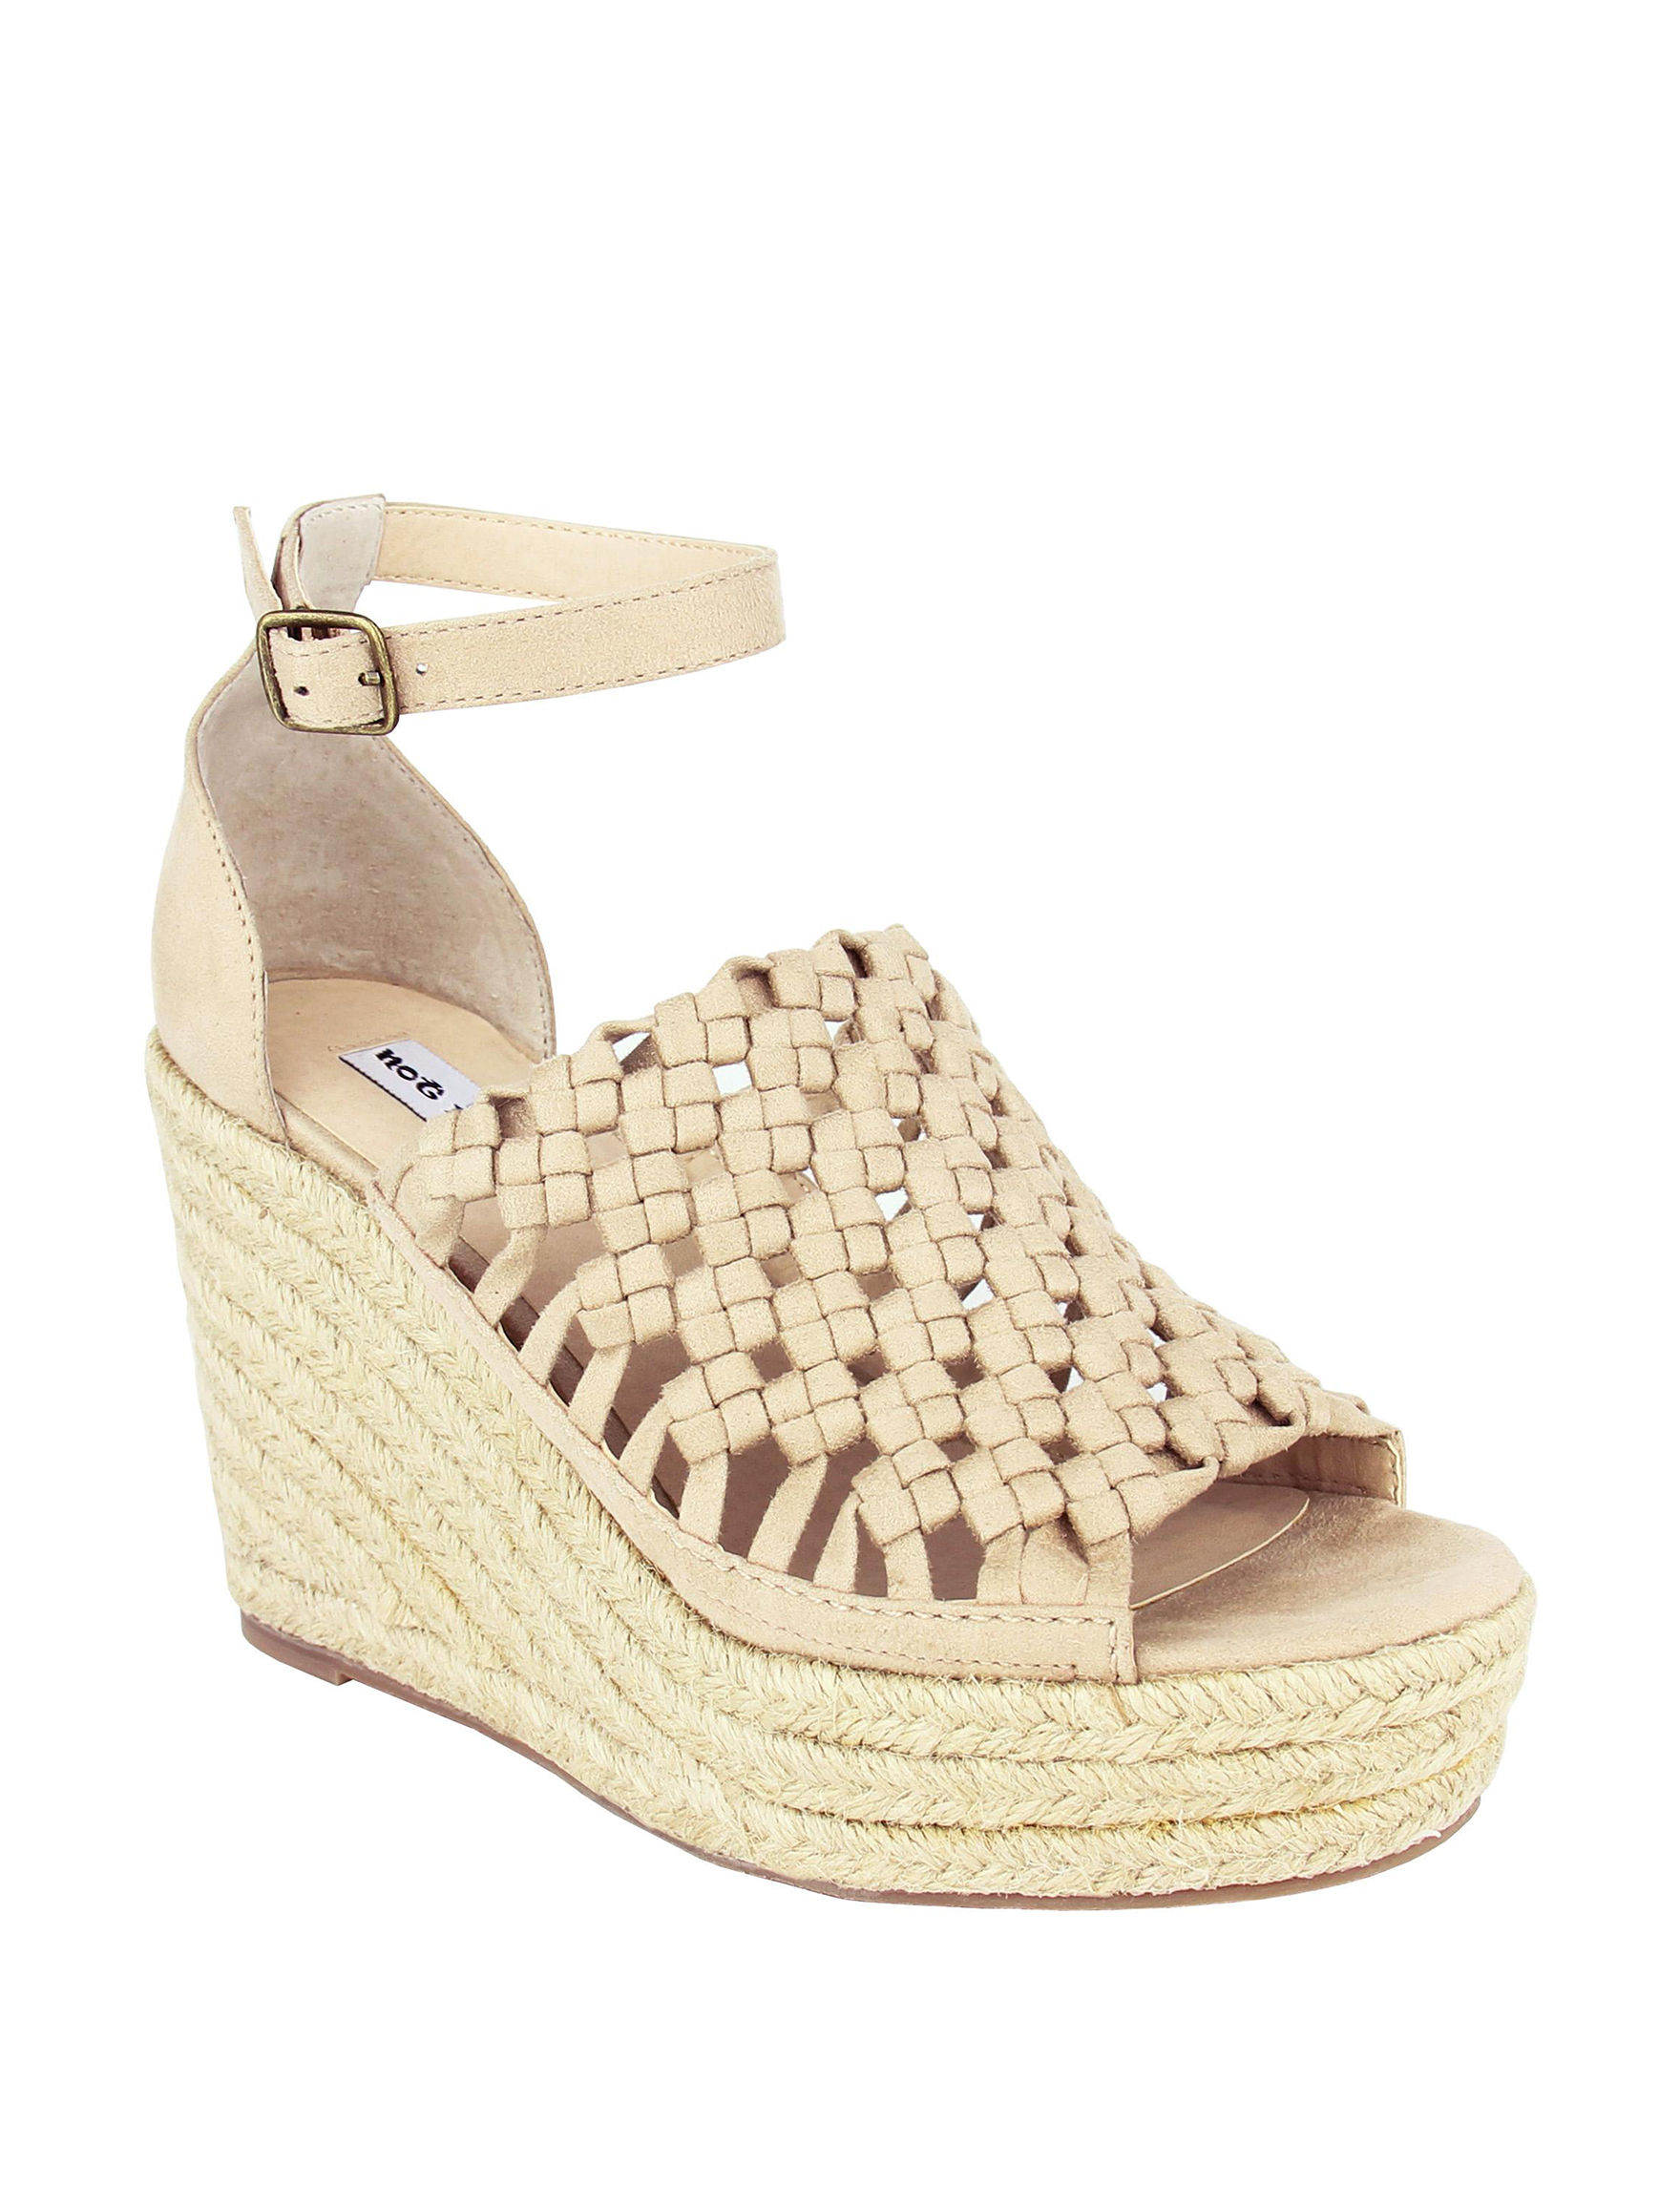 Not Rated Nude Peep Toe Platform Wedge Sandals